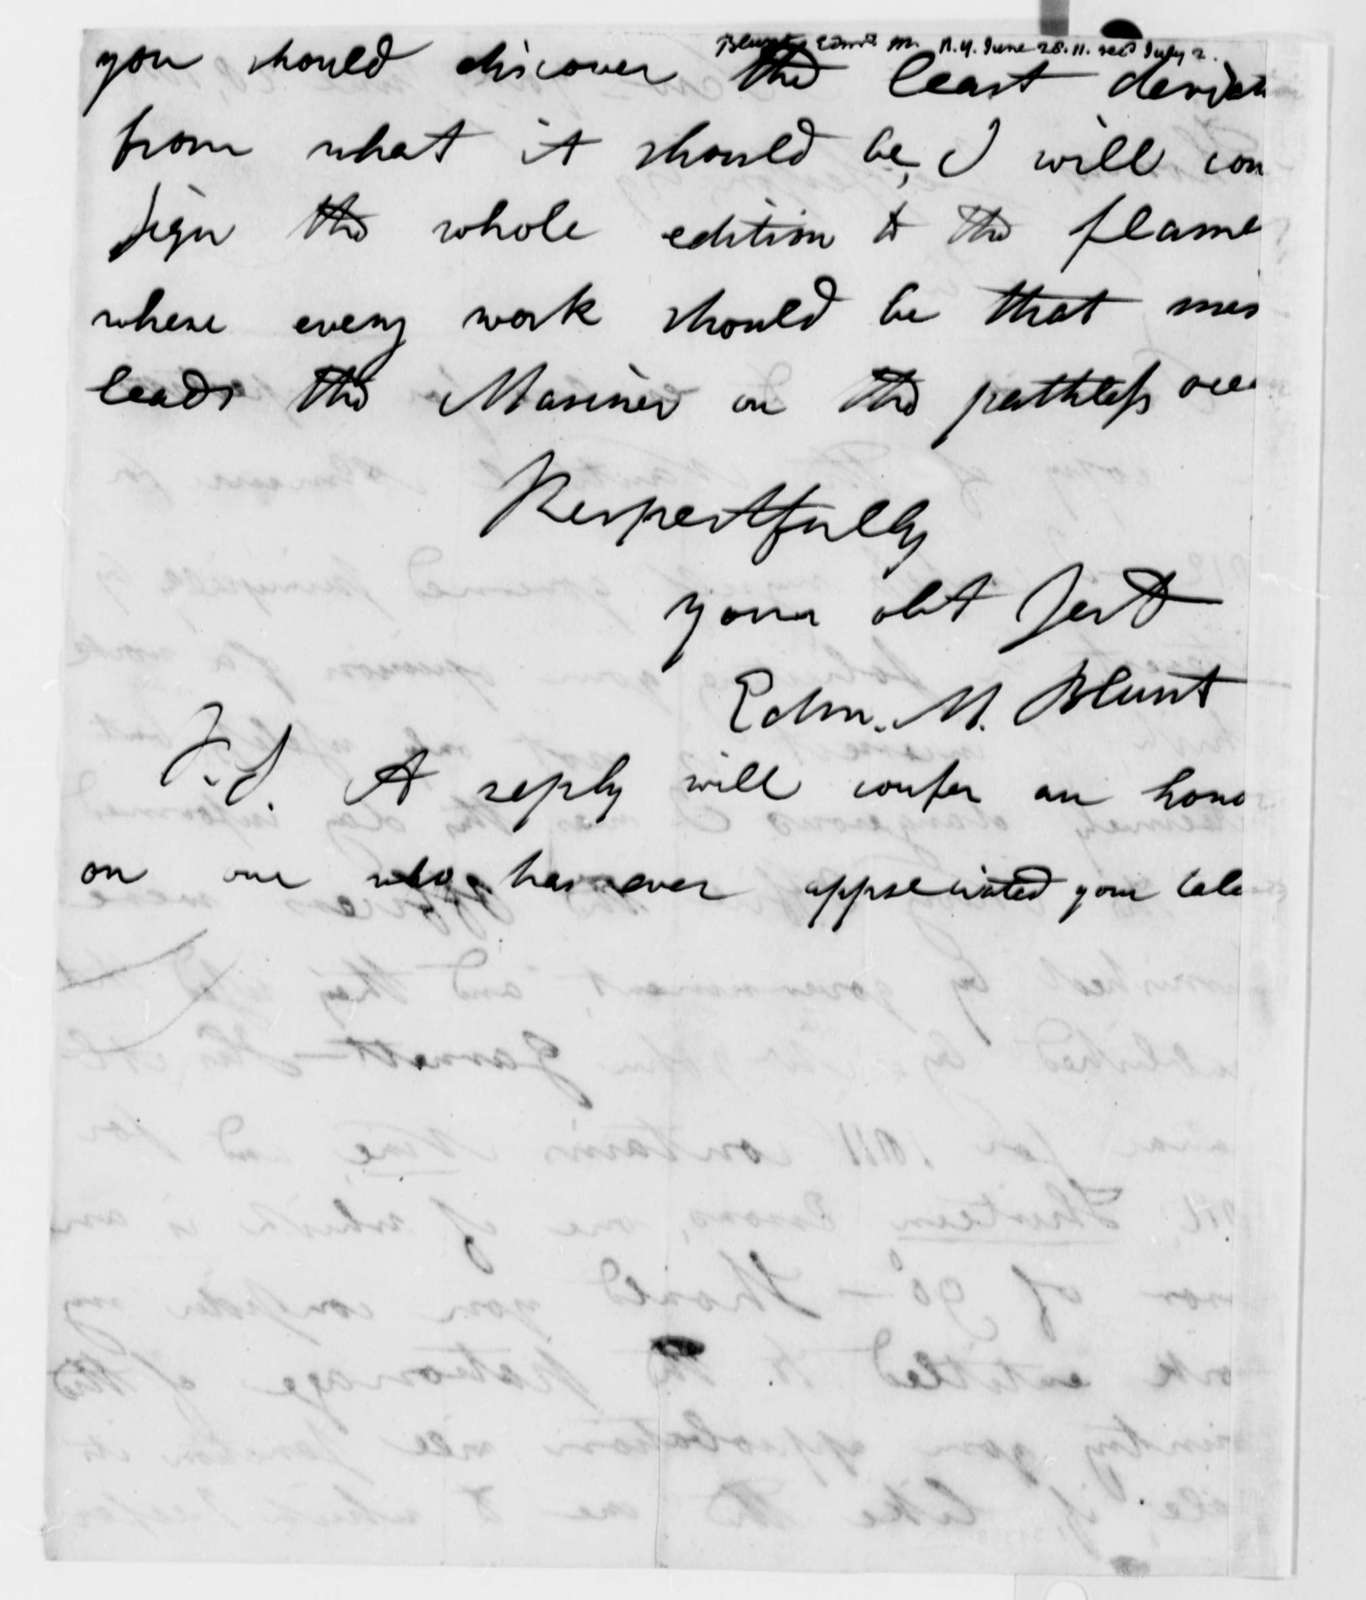 Edmund M. Blunt to Thomas Jefferson, June 28, 1811